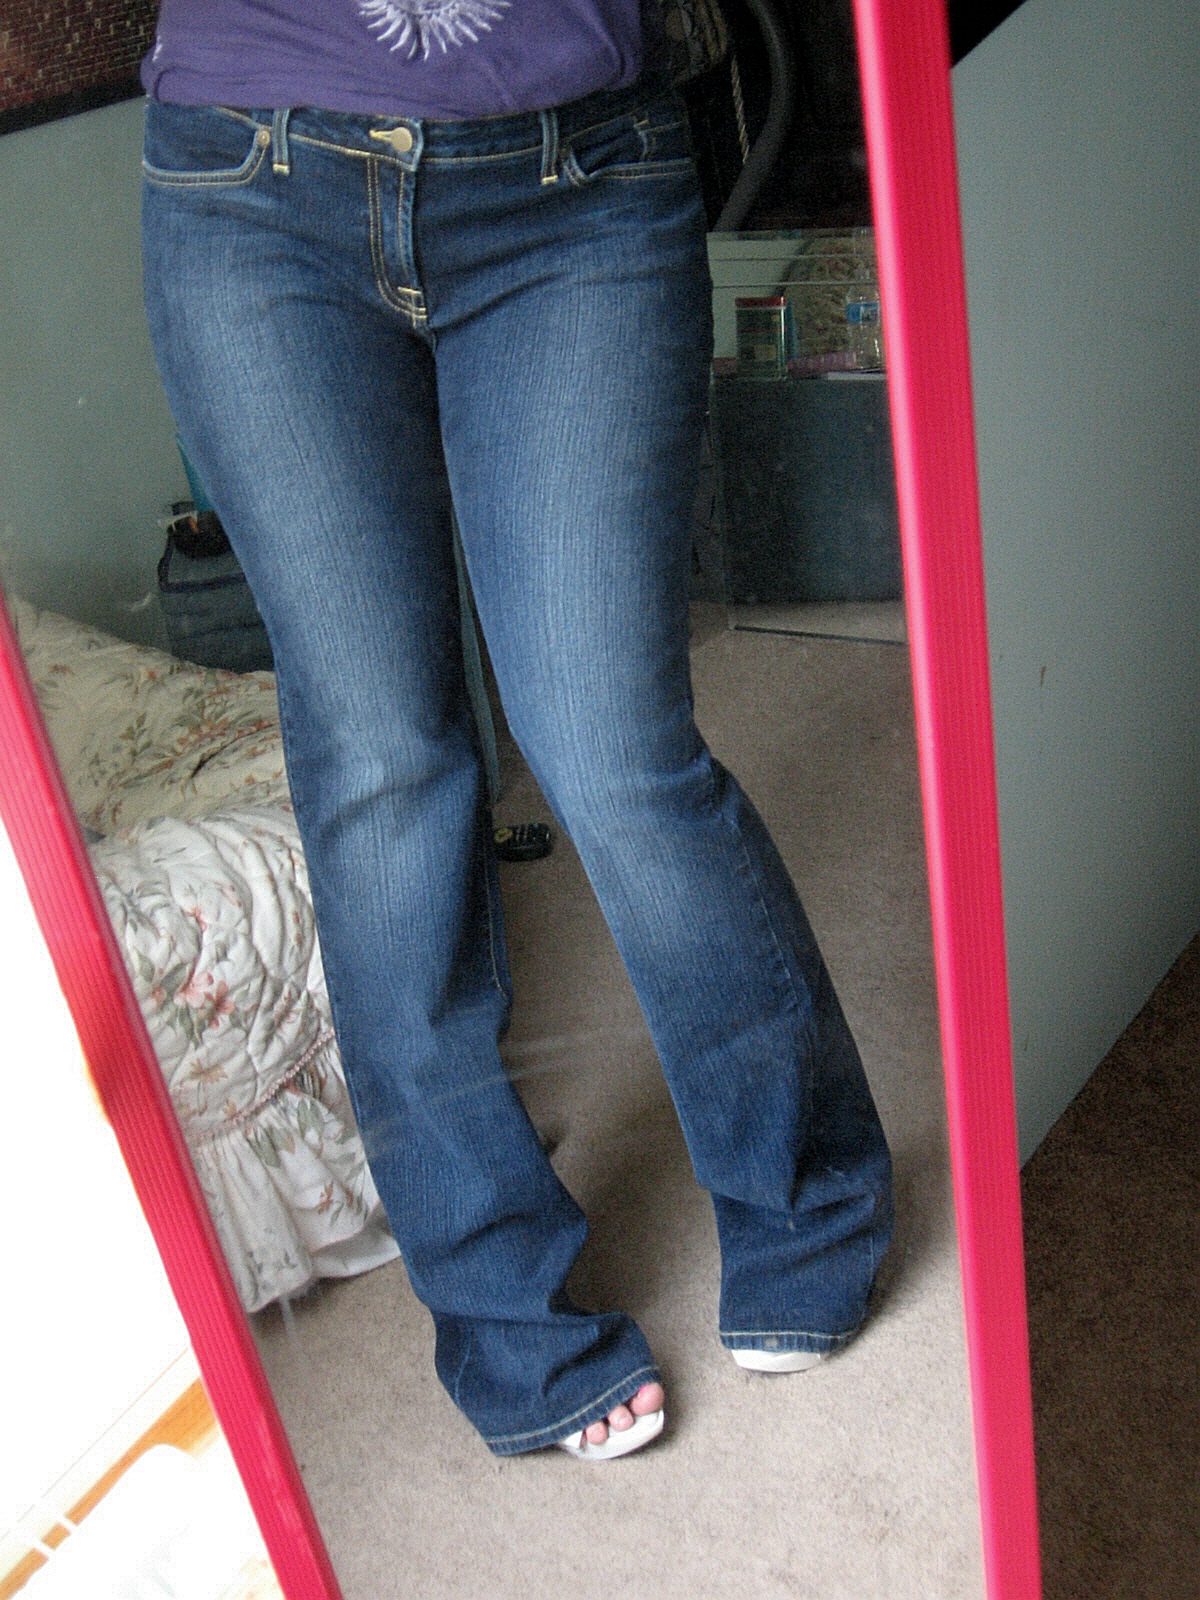 hypnotic blend: hello! SkinnyJeans